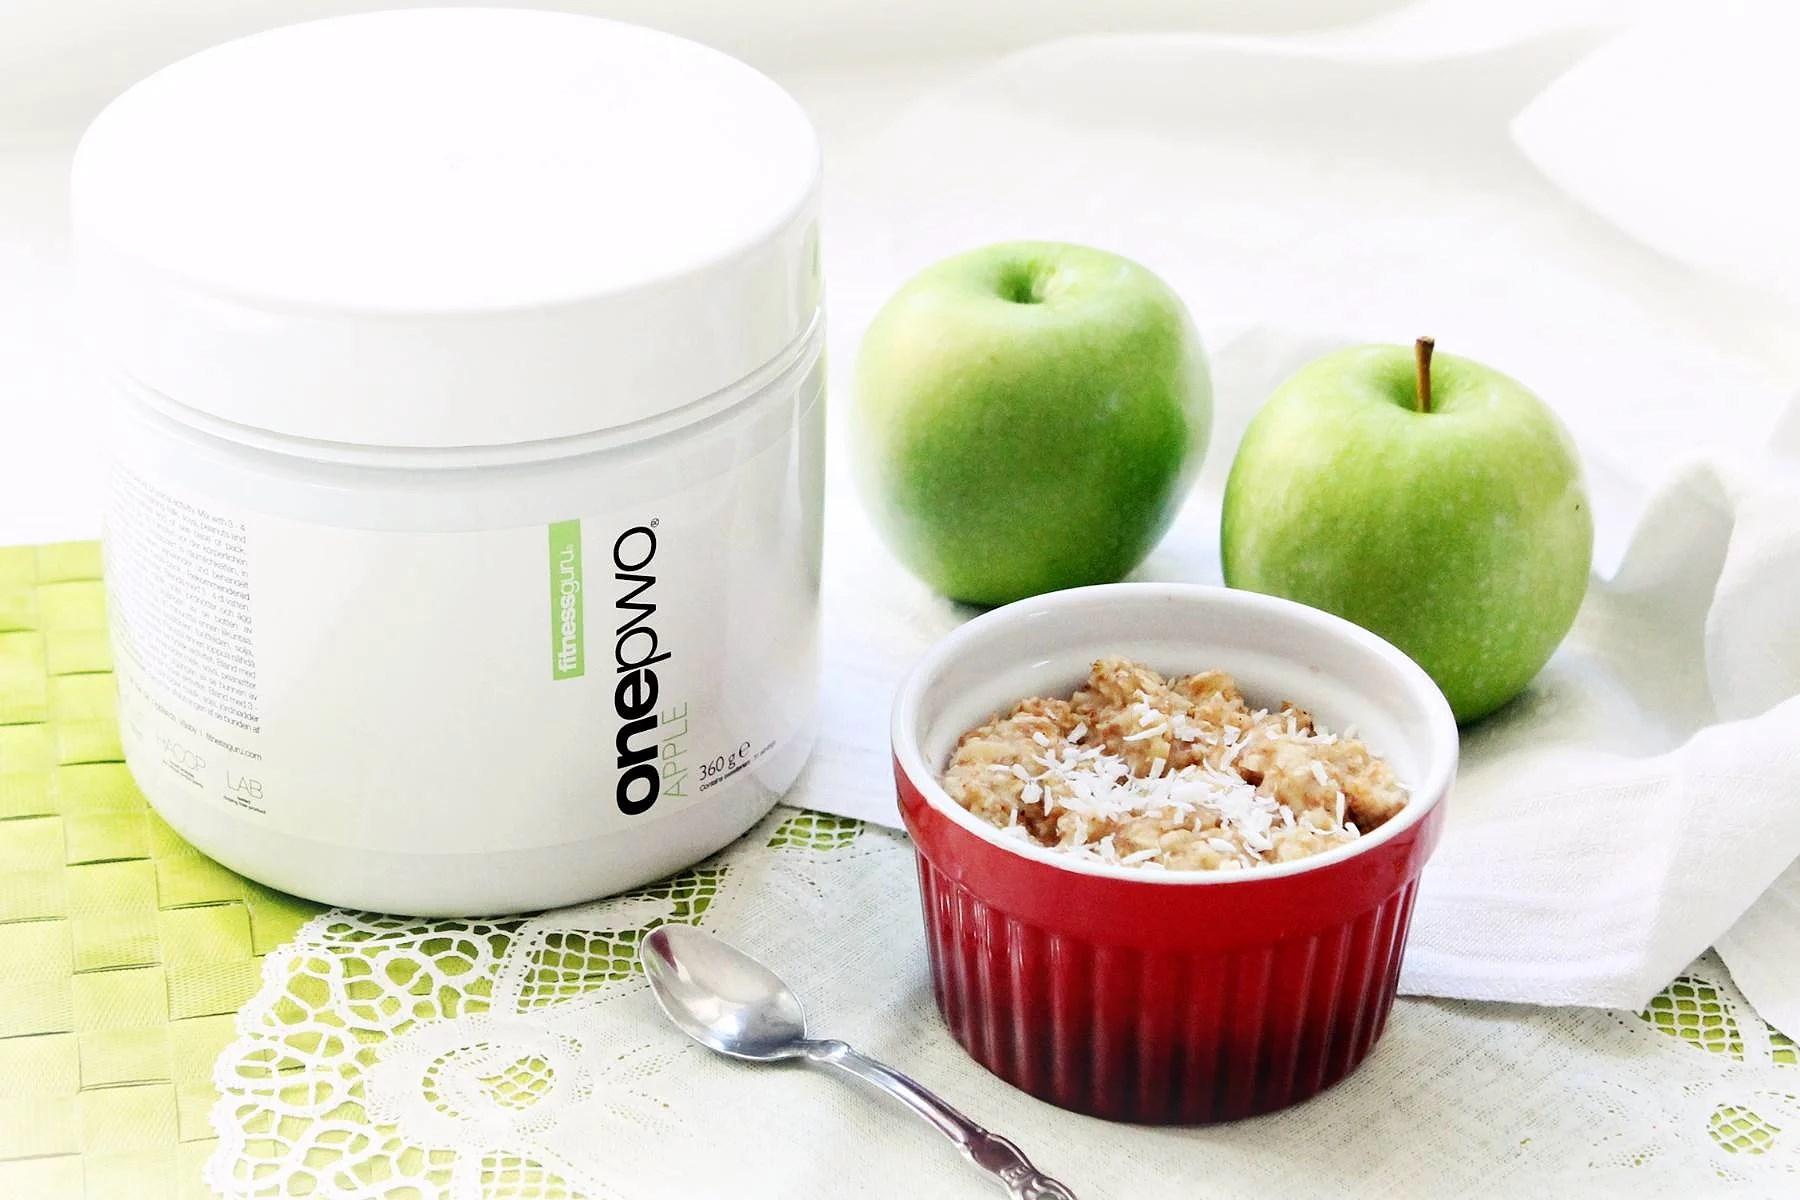 Apple Mug Cake and Fitnessguru Apple One Pwo